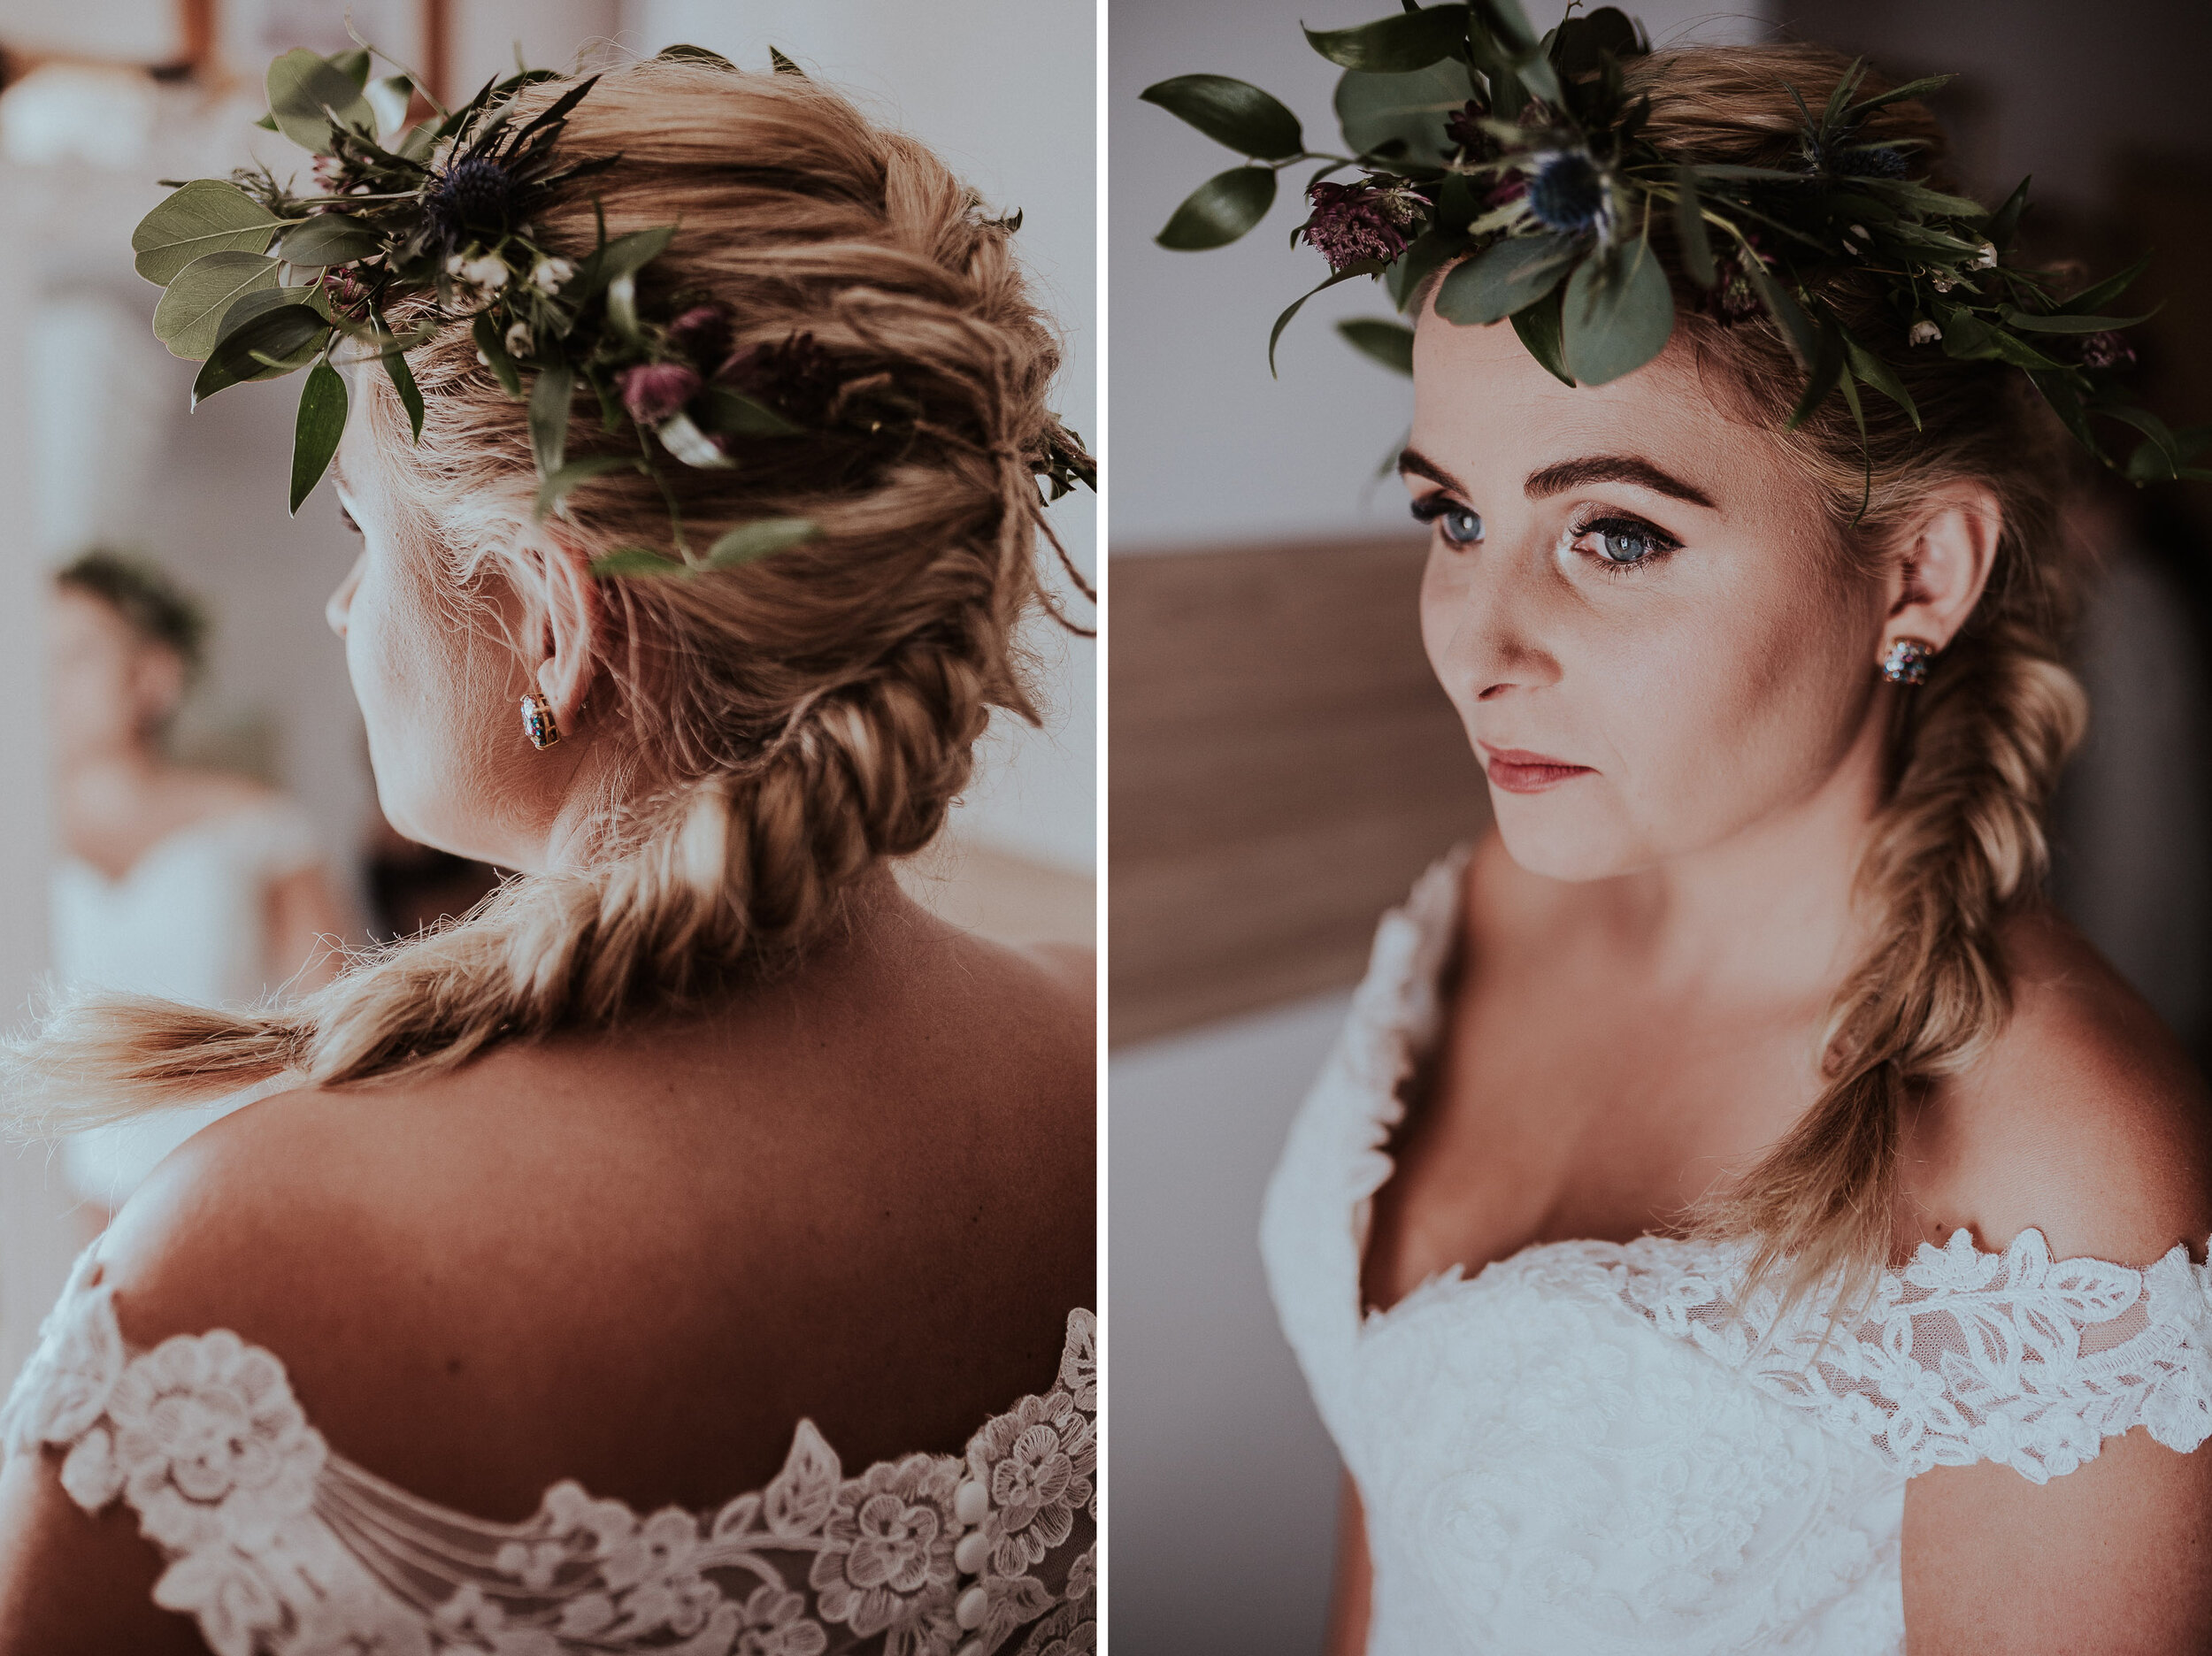 Norfolk_Alternative_Wedding_Photographer-26 copy.jpg